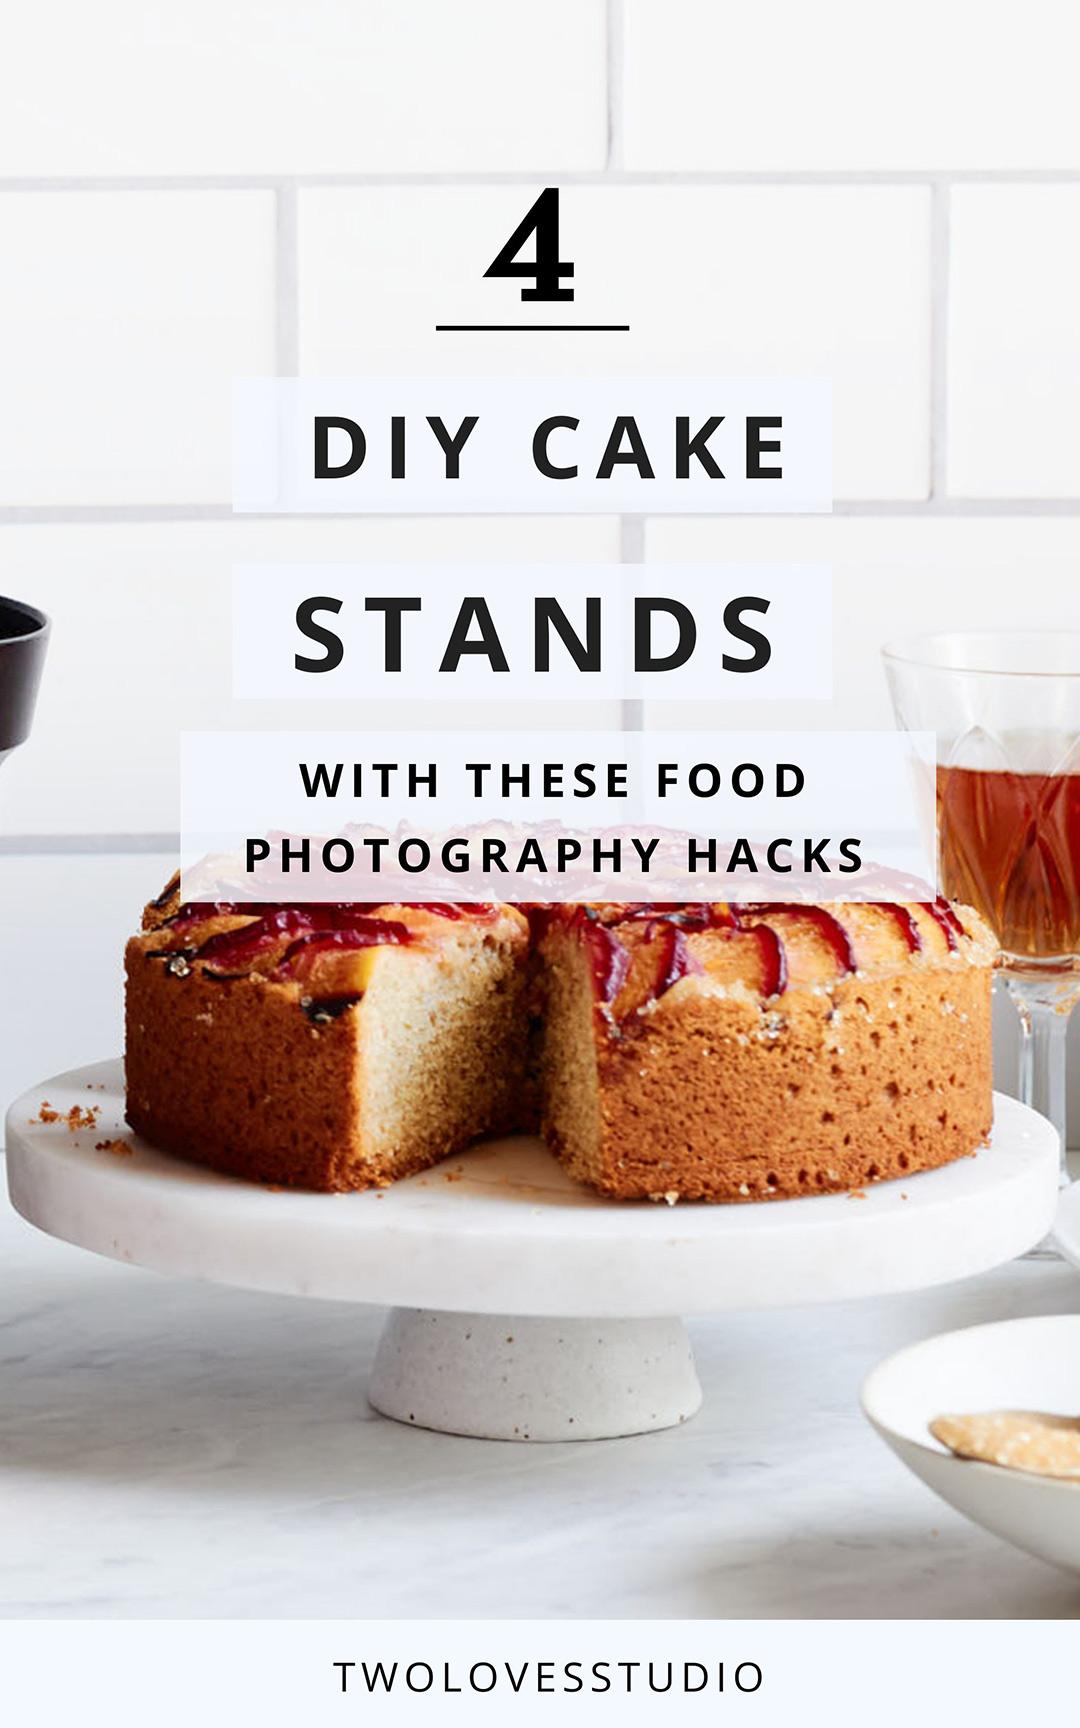 Plum cake on cake stand